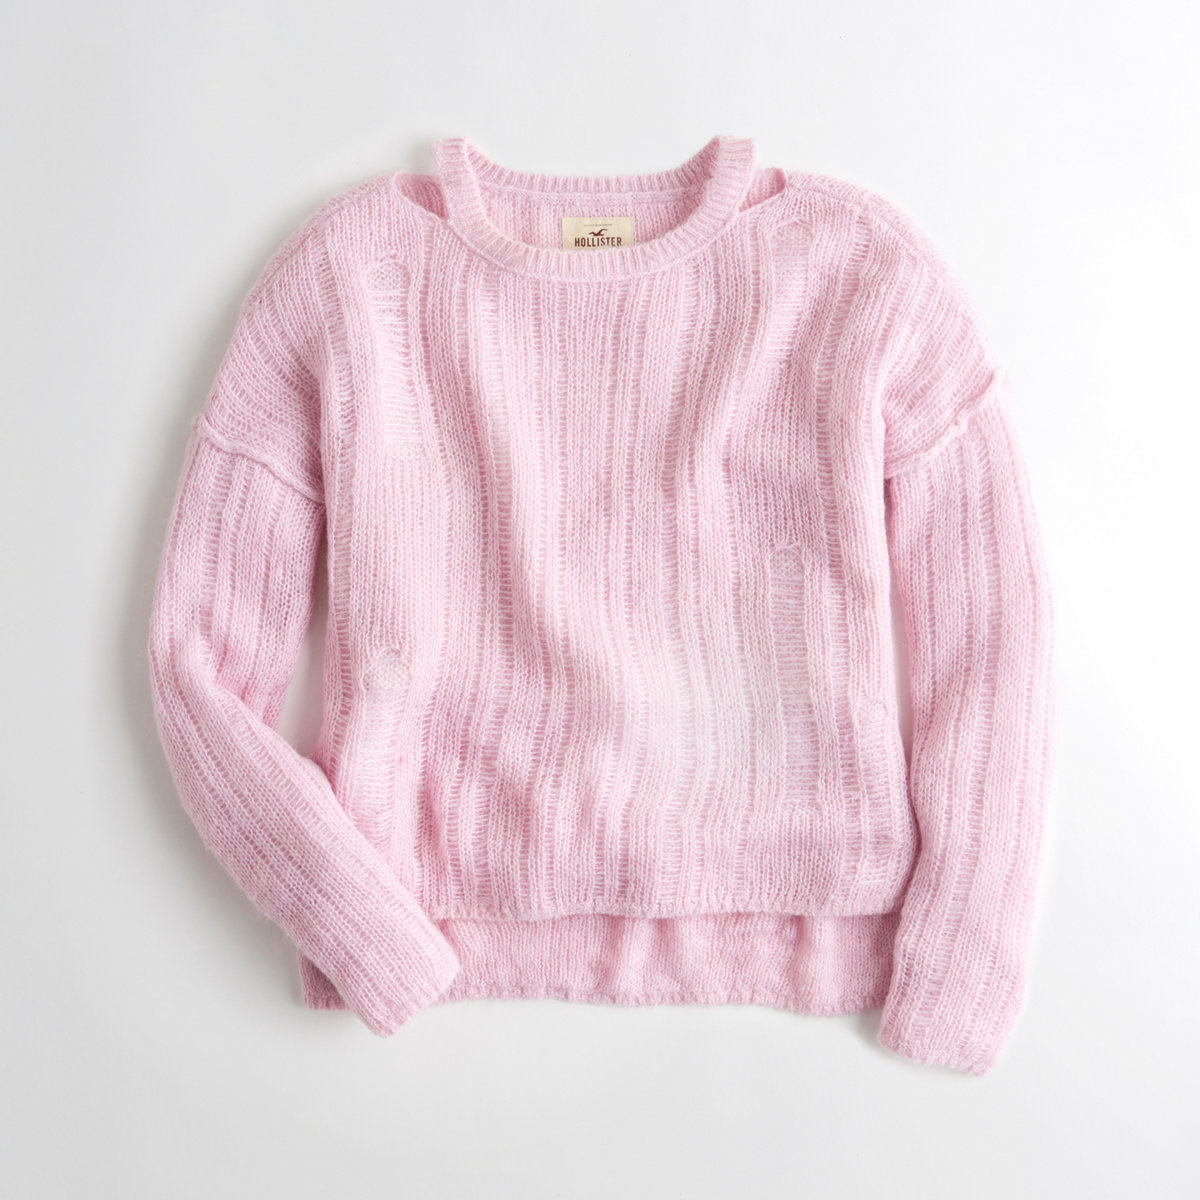 Distressed Oversized Crewneck Sweater